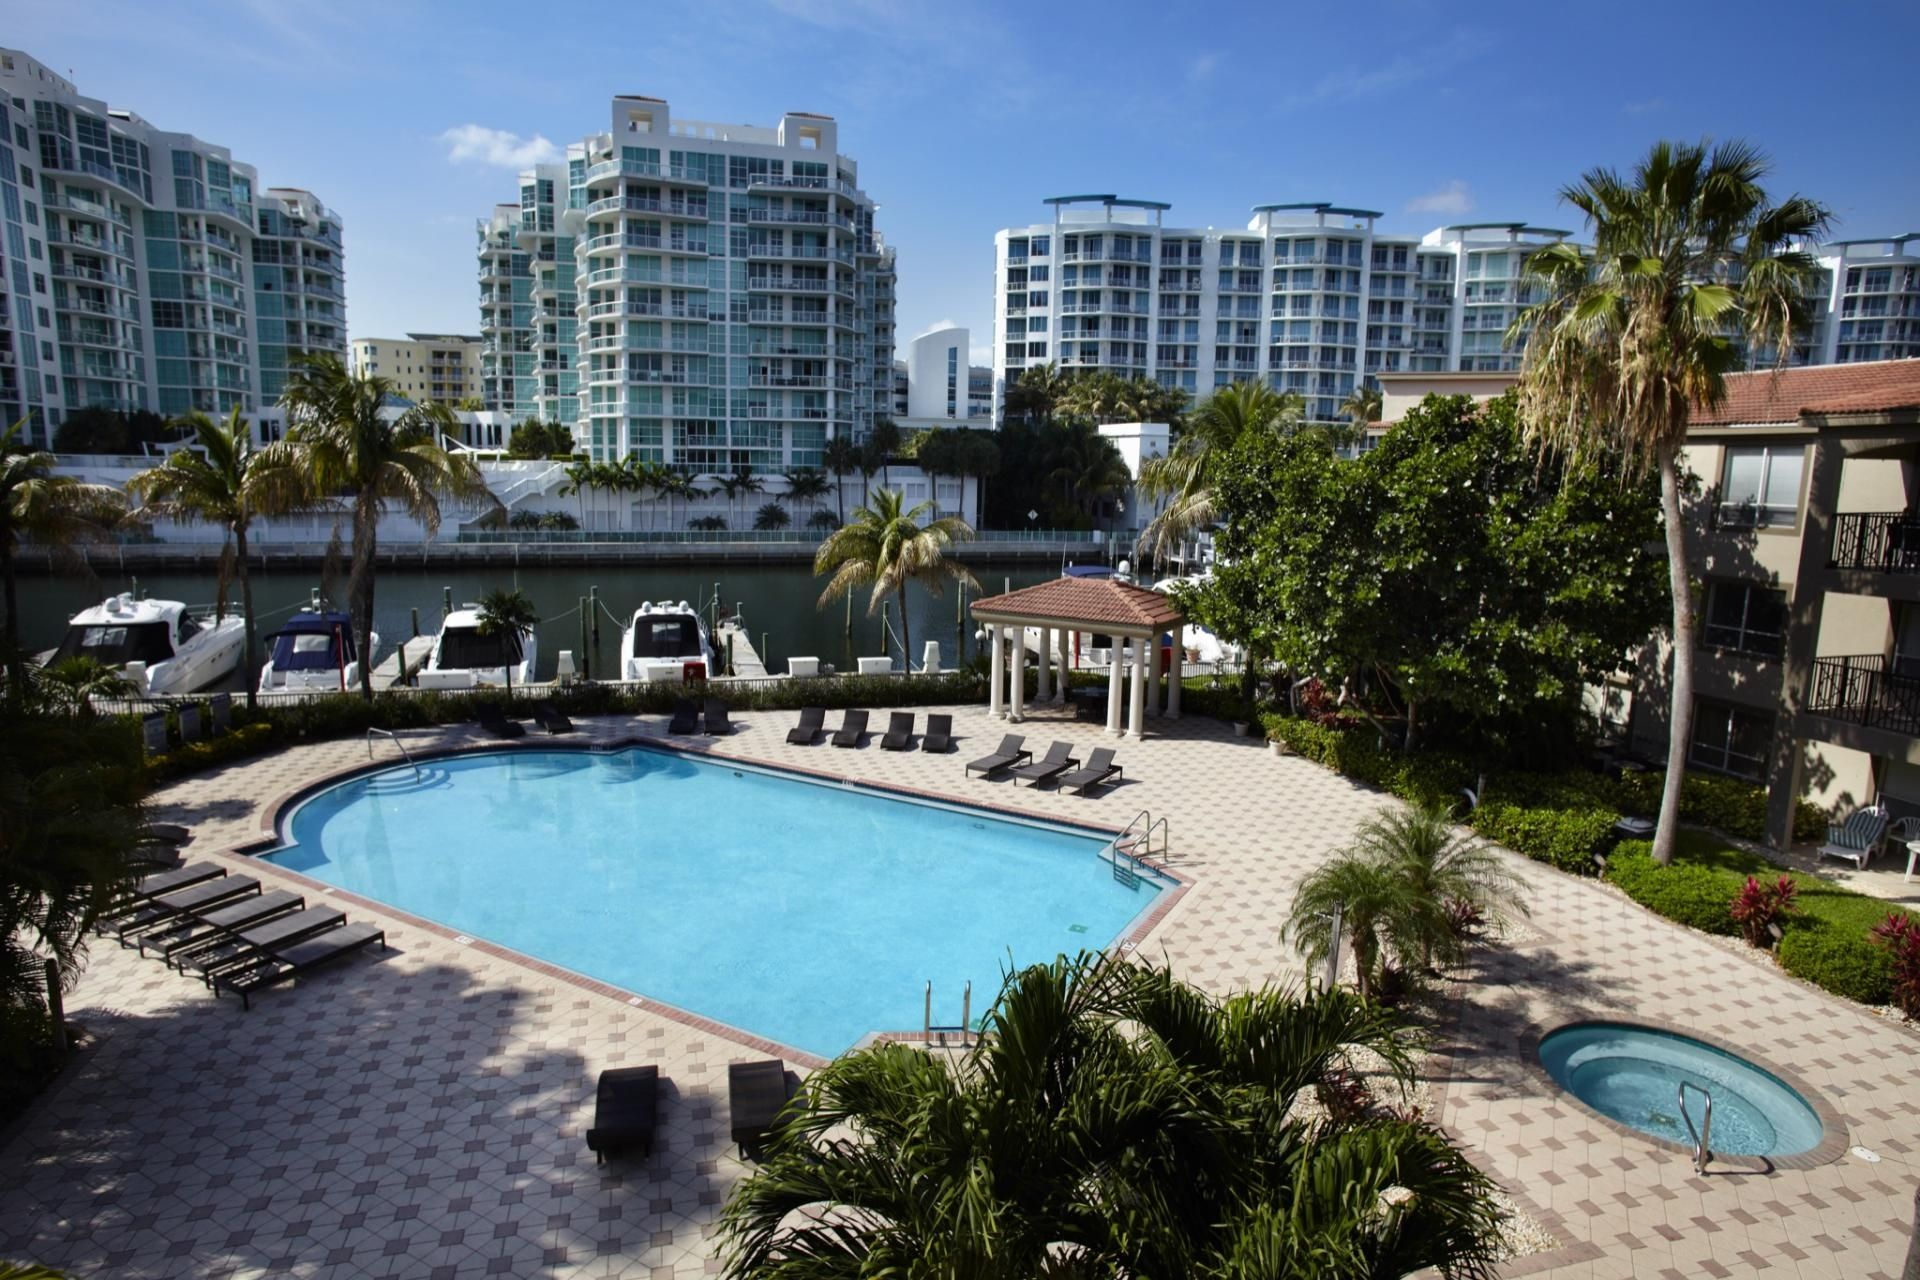 Apartments For Rent In Aventura Fl Camden Aventura Apartment Pool Pool Apartments For Rent